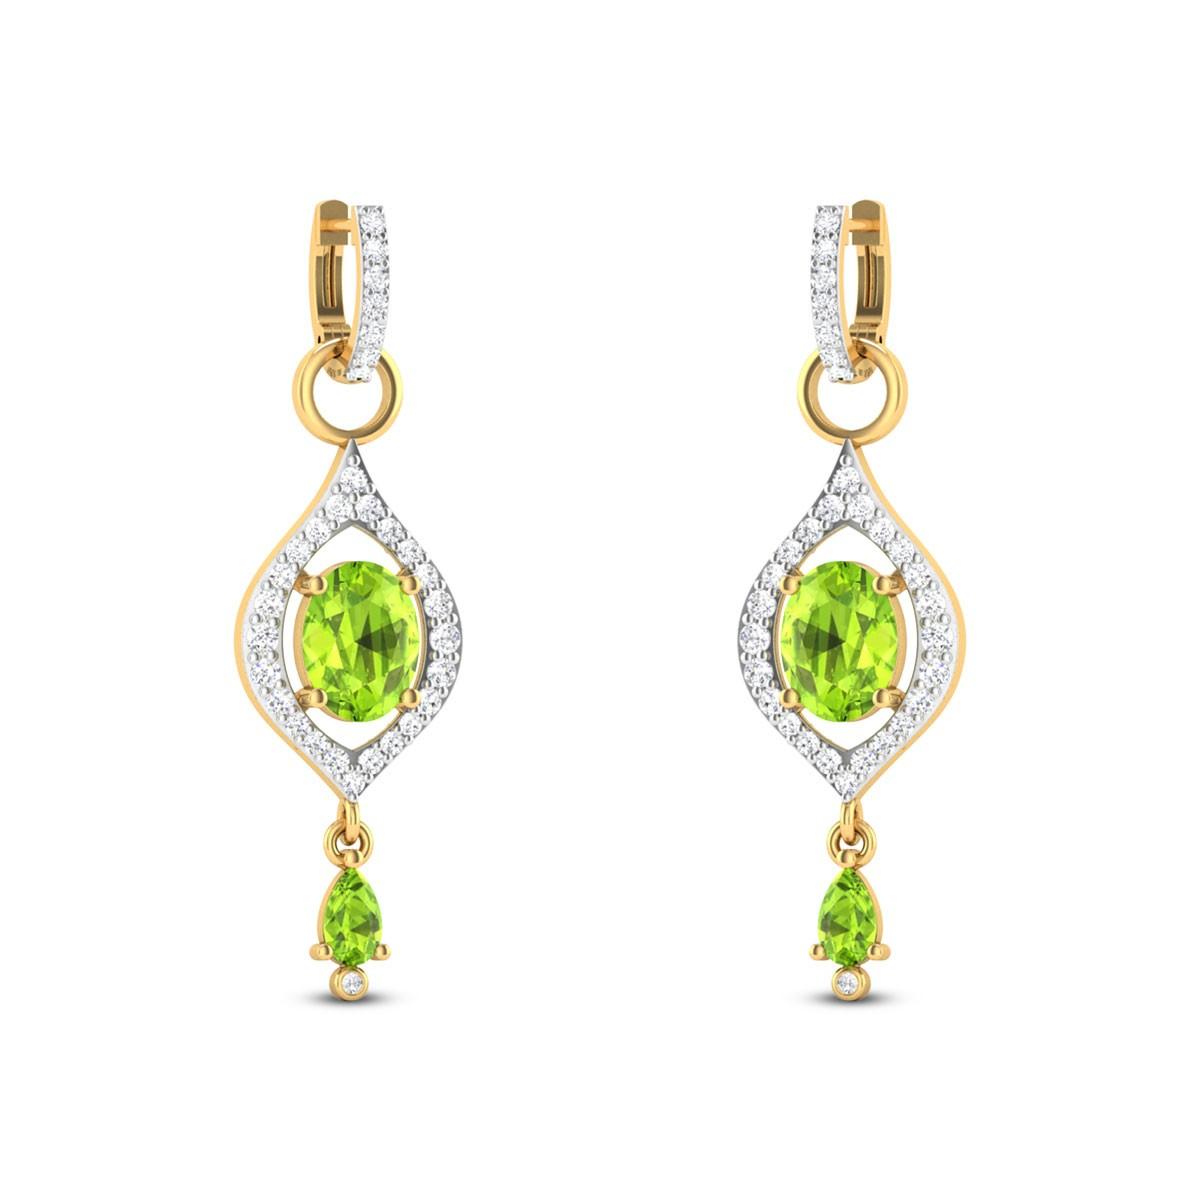 Shiri Diamond Earrings